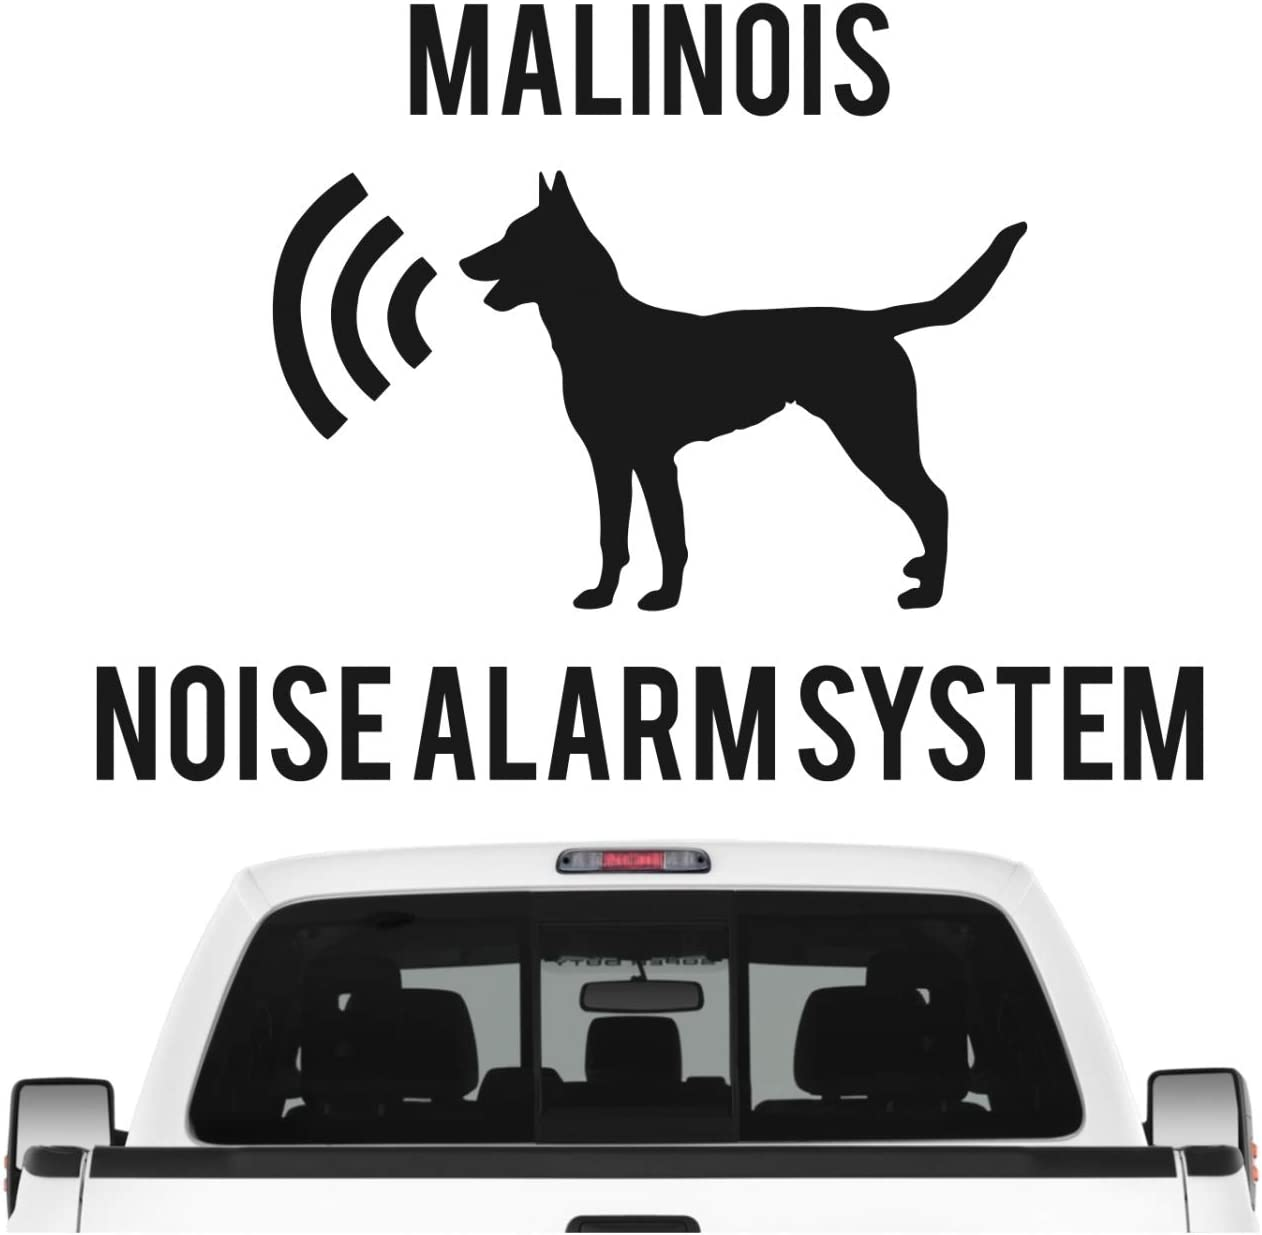 Siviwonder Malinois Noise Alarmsystem Auto Aufkleber Hund Folie Belgian Mali Berger Farbe Schwarz Matt Größe 10cm Auto